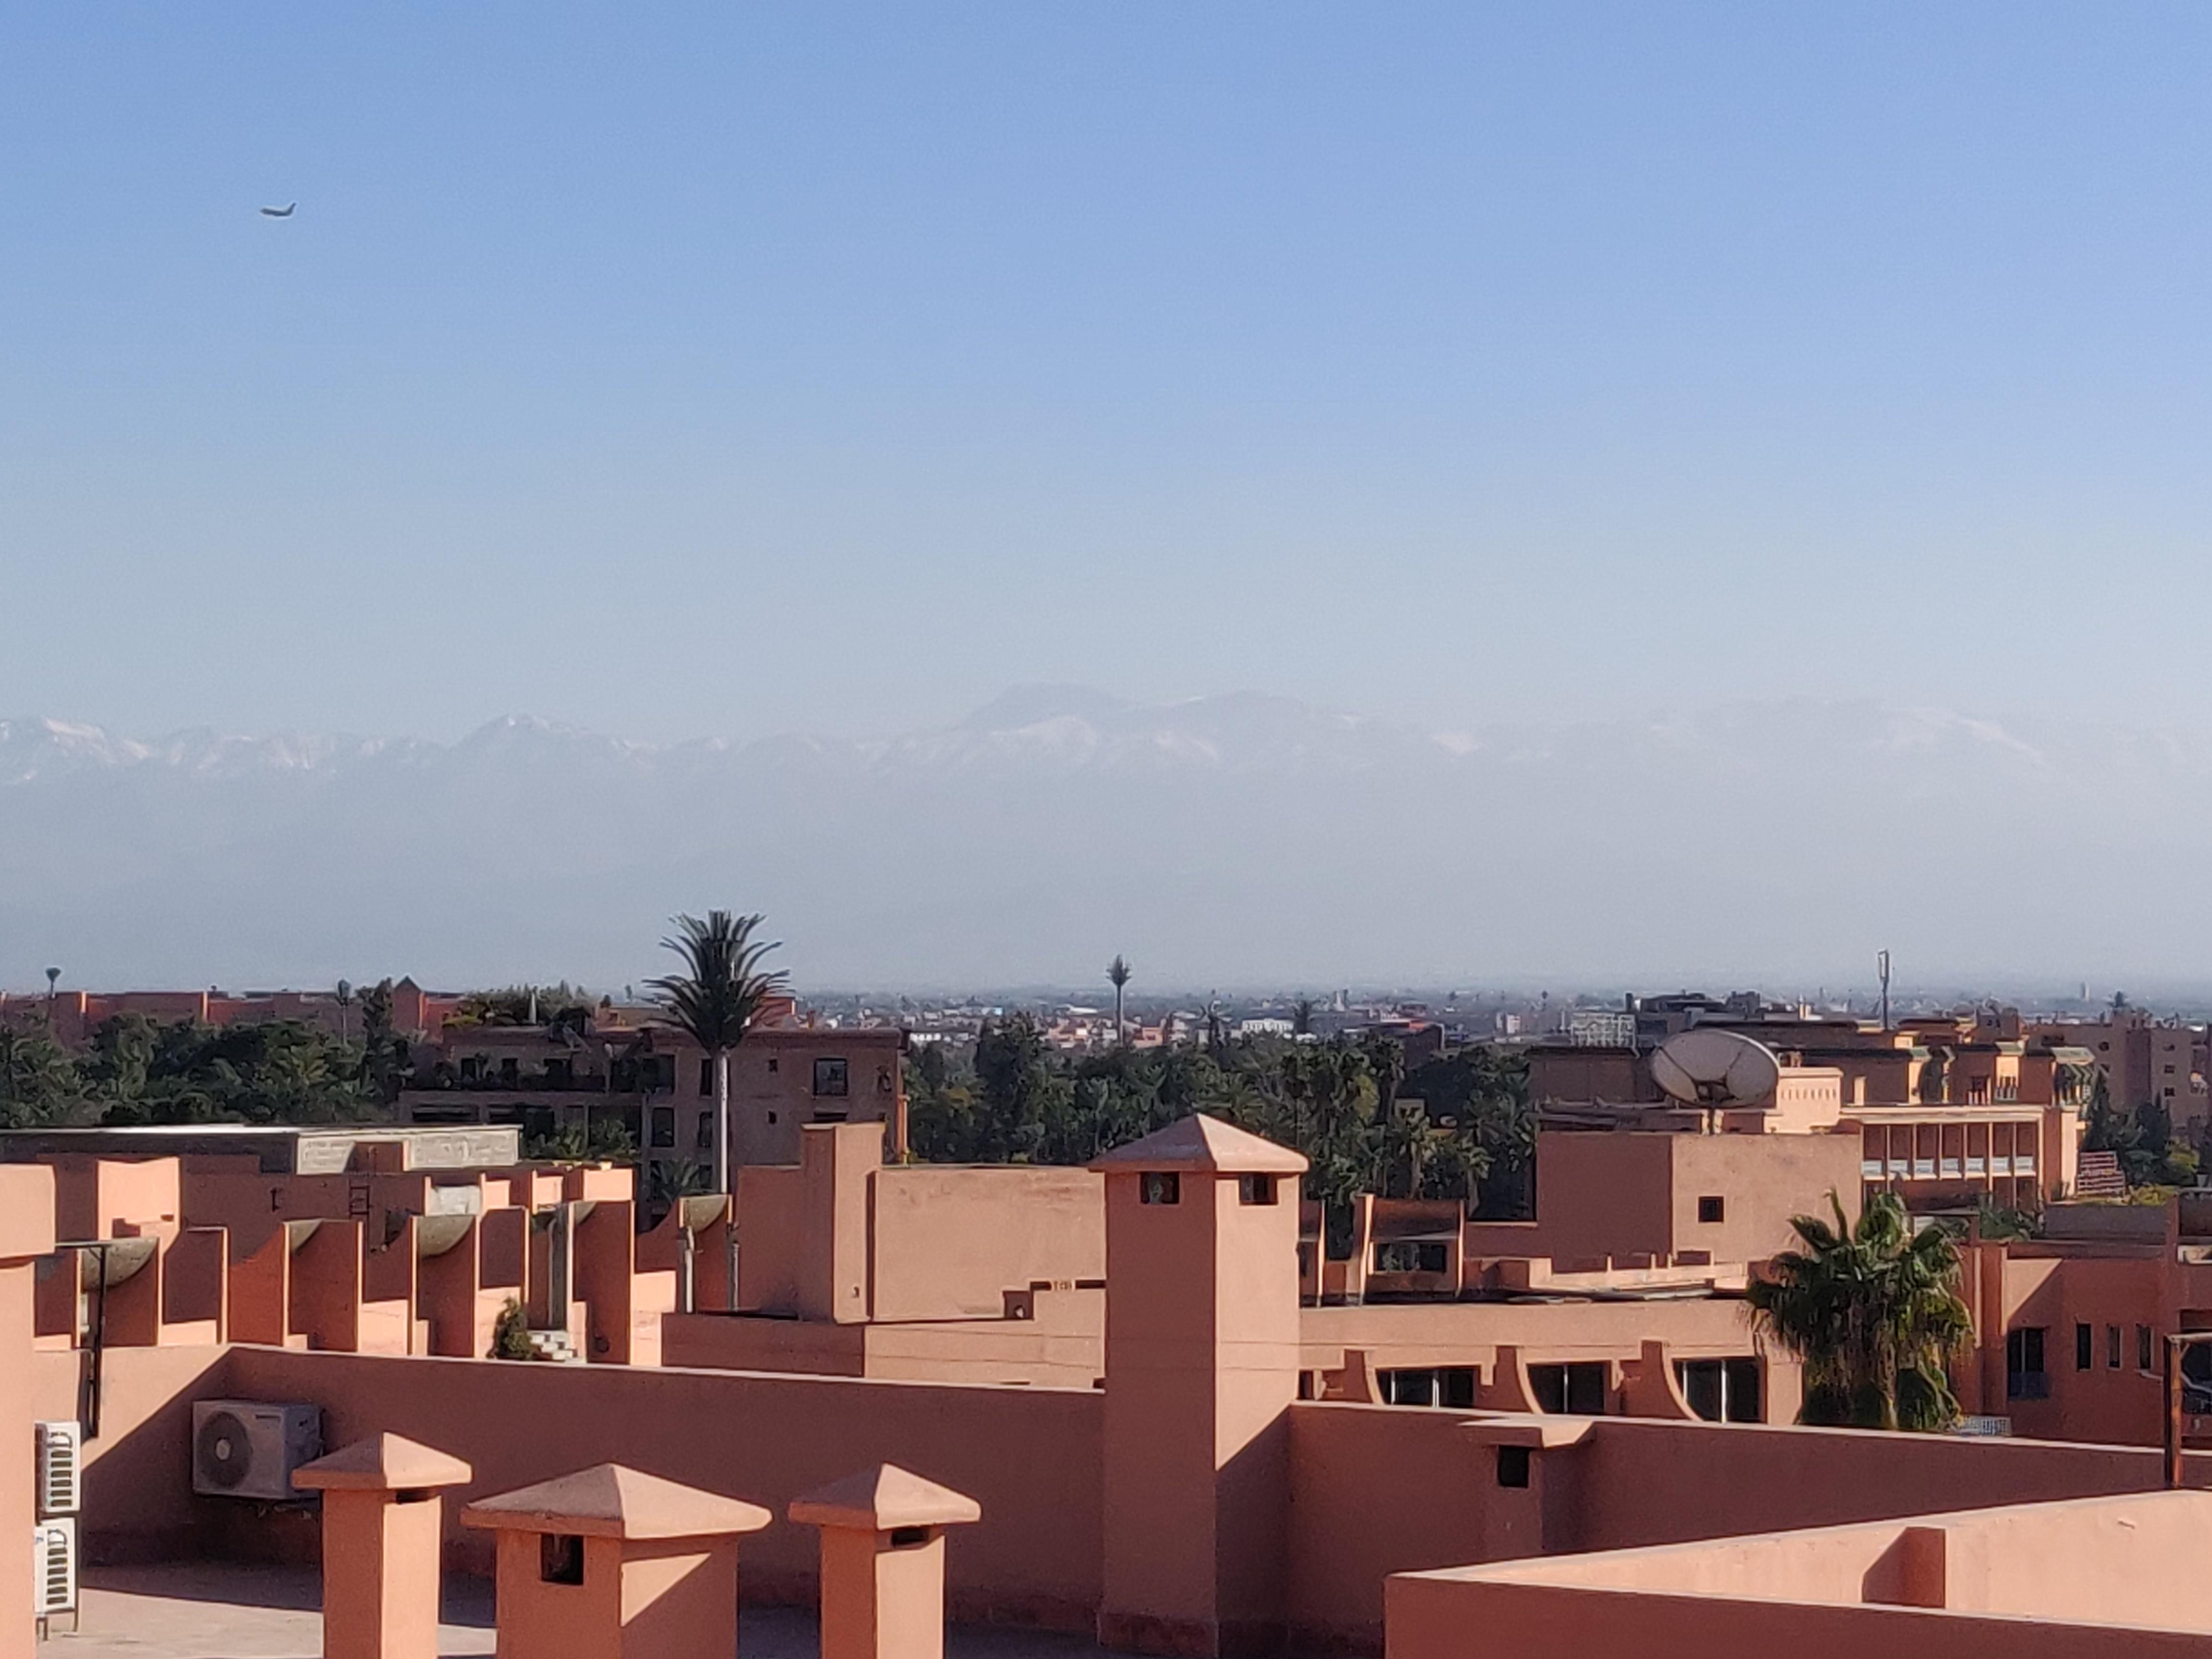 wordpress-marrakech-maroc-morroco-voyage-lacher-prise-tete-liberte-vie-size-taille